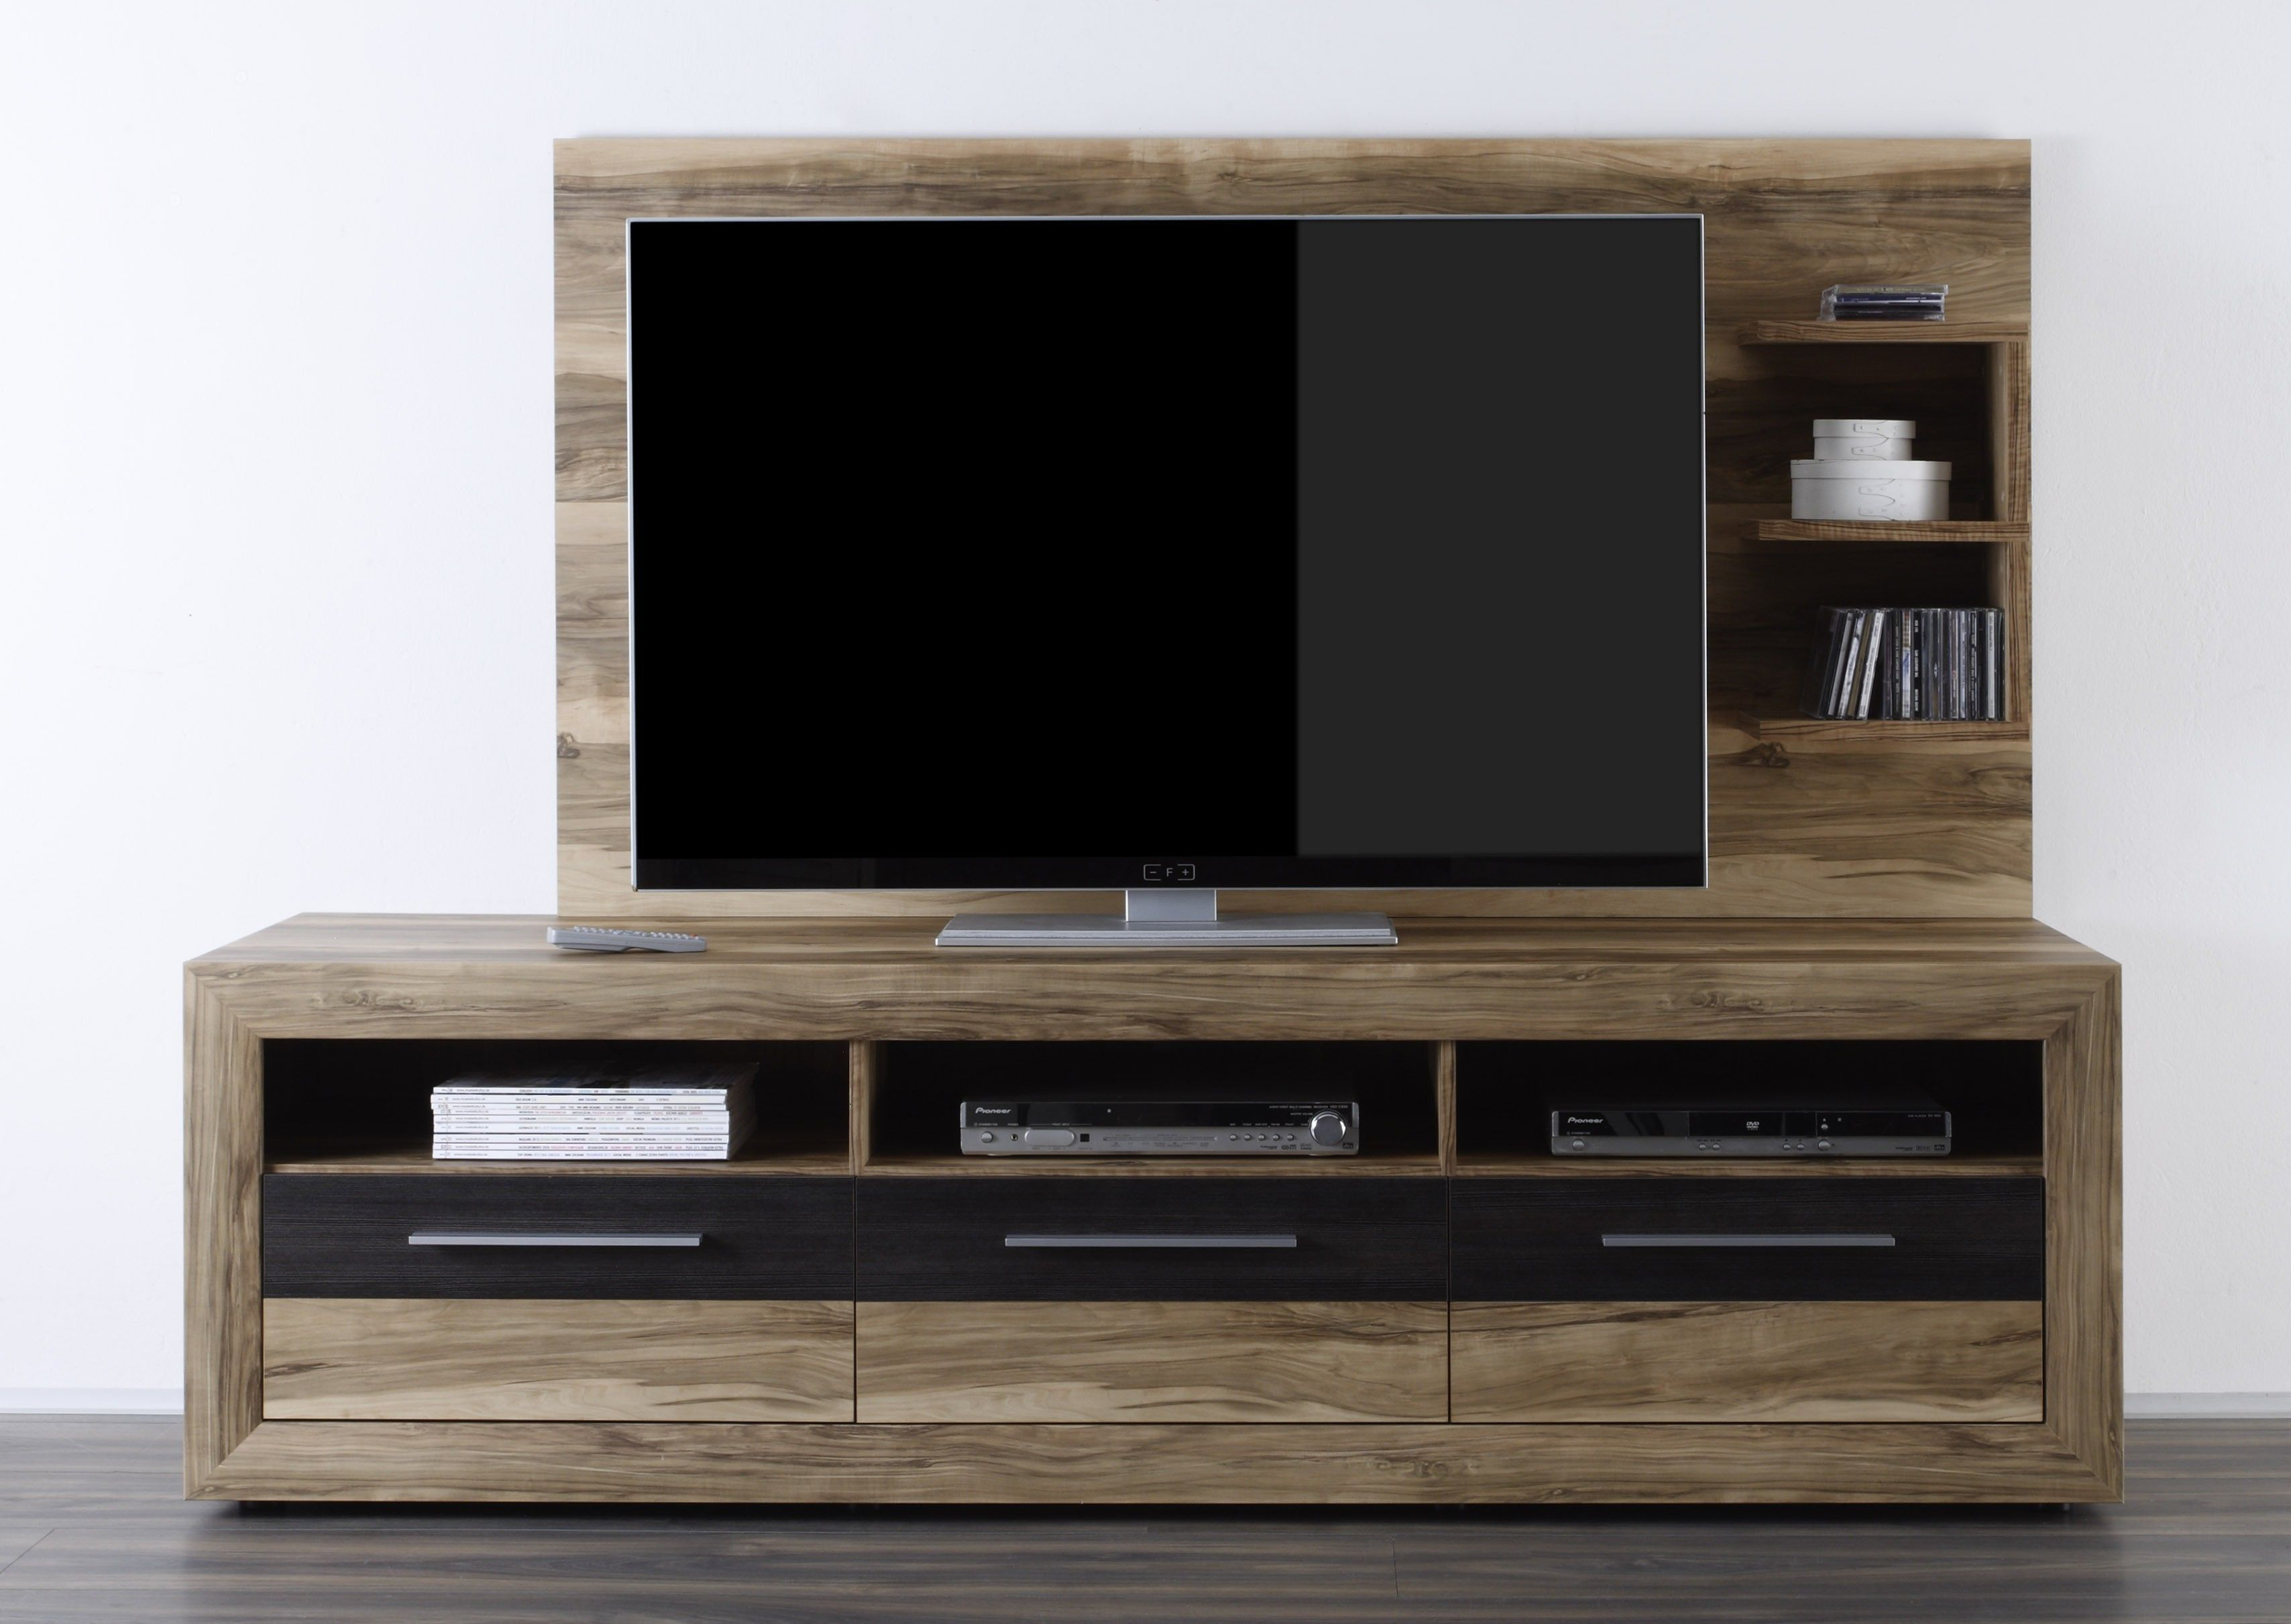 Moderne tv eckmöbel  Billig tv möbel modern | Deutsche Deko | Pinterest | TV Möbel ...